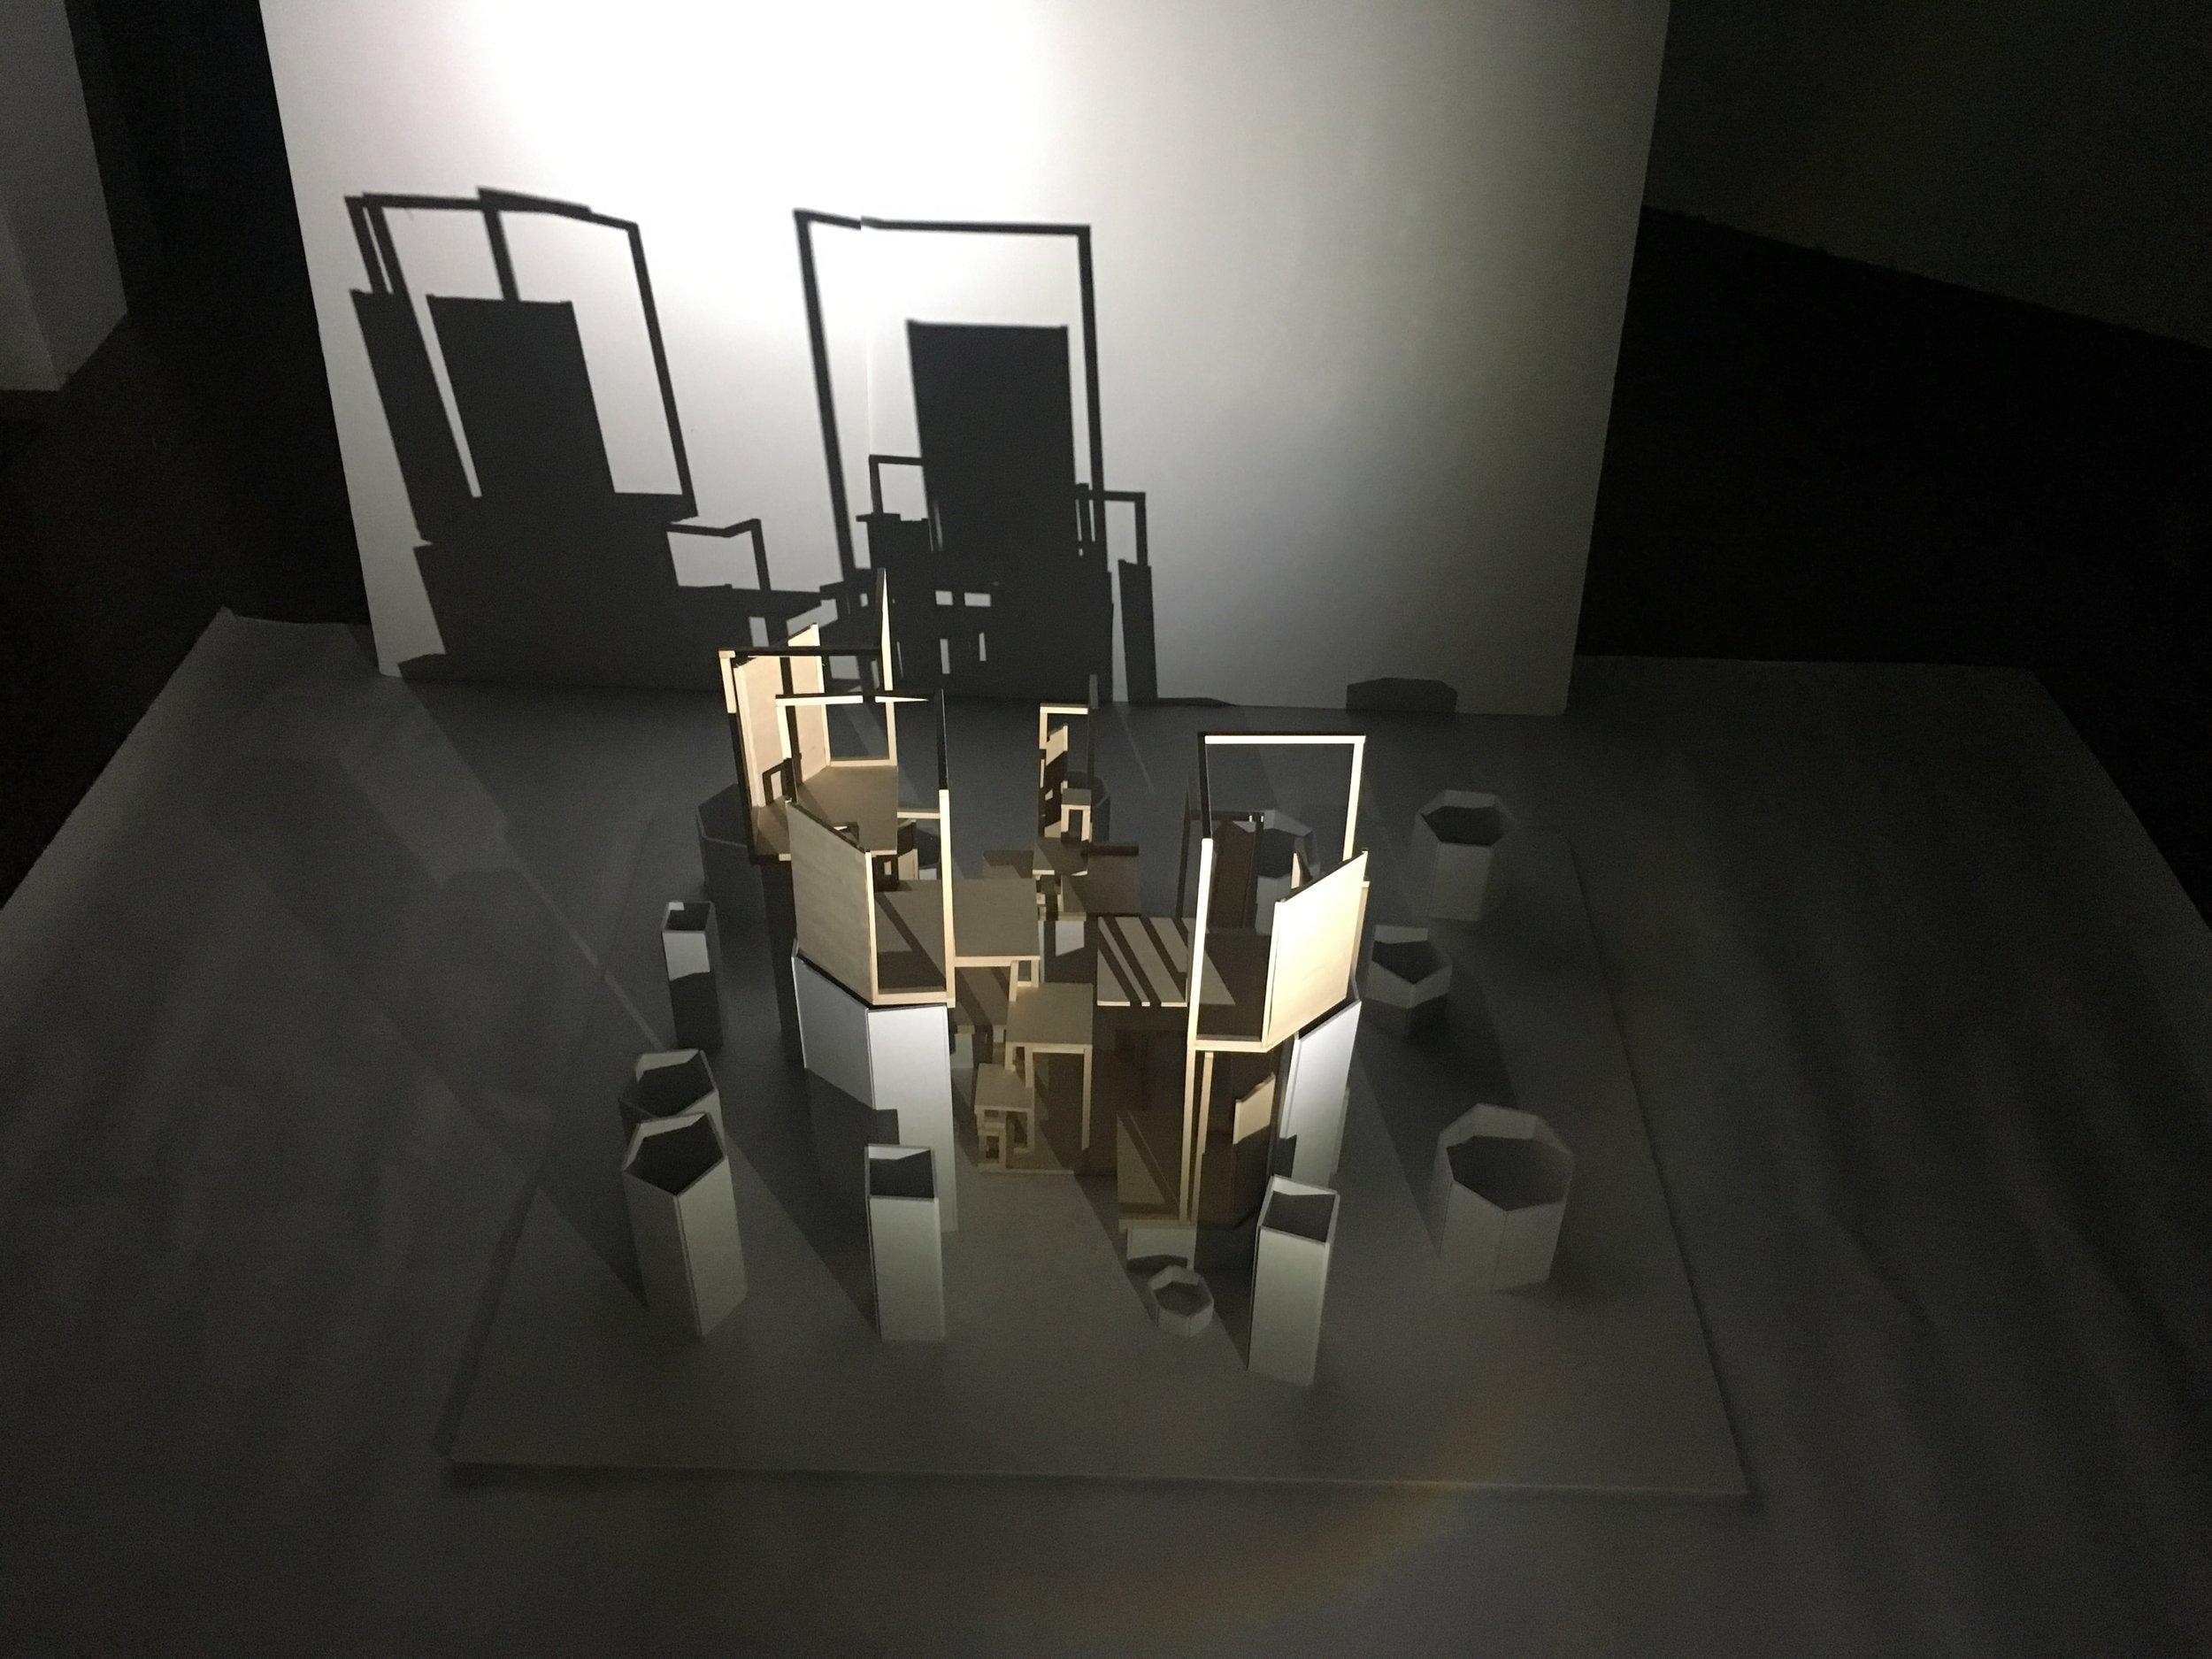 shadow-study-1-min.jpg